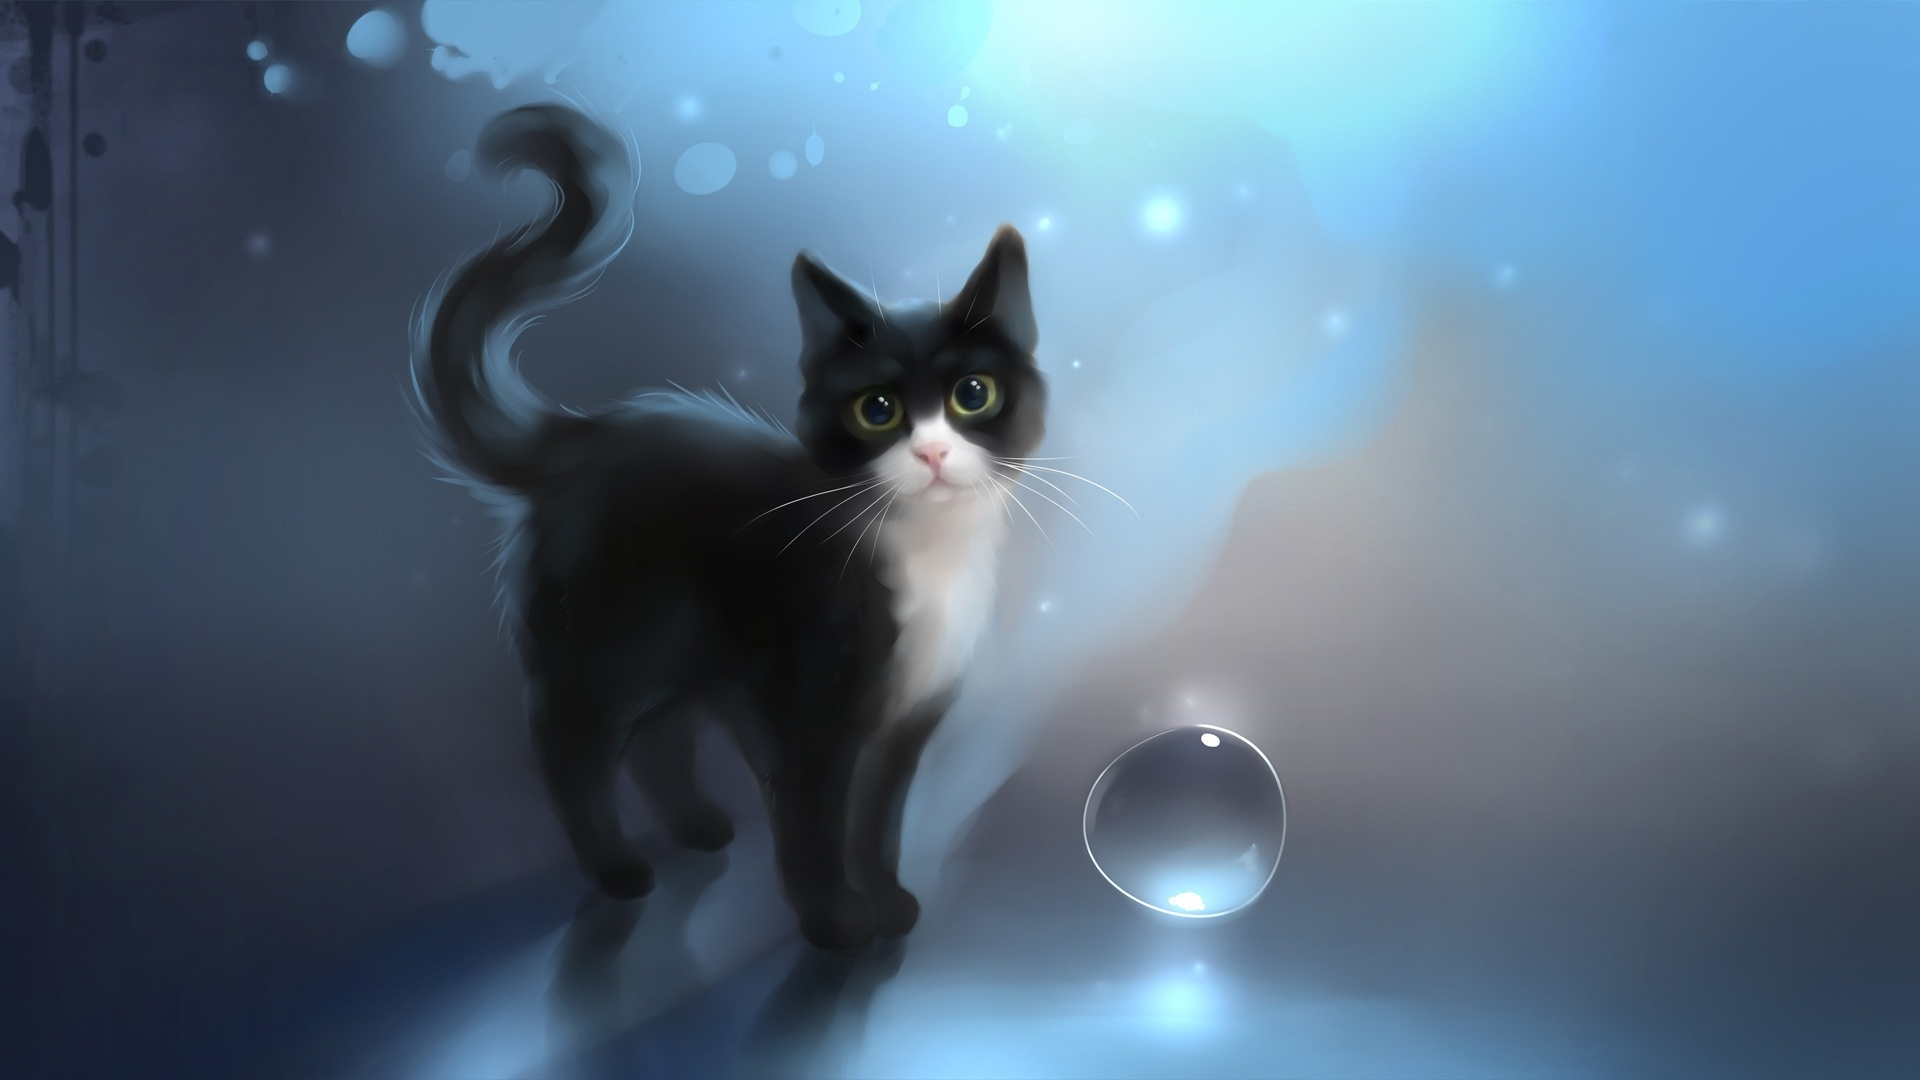 Drawn Cats desktop wallpaper hd